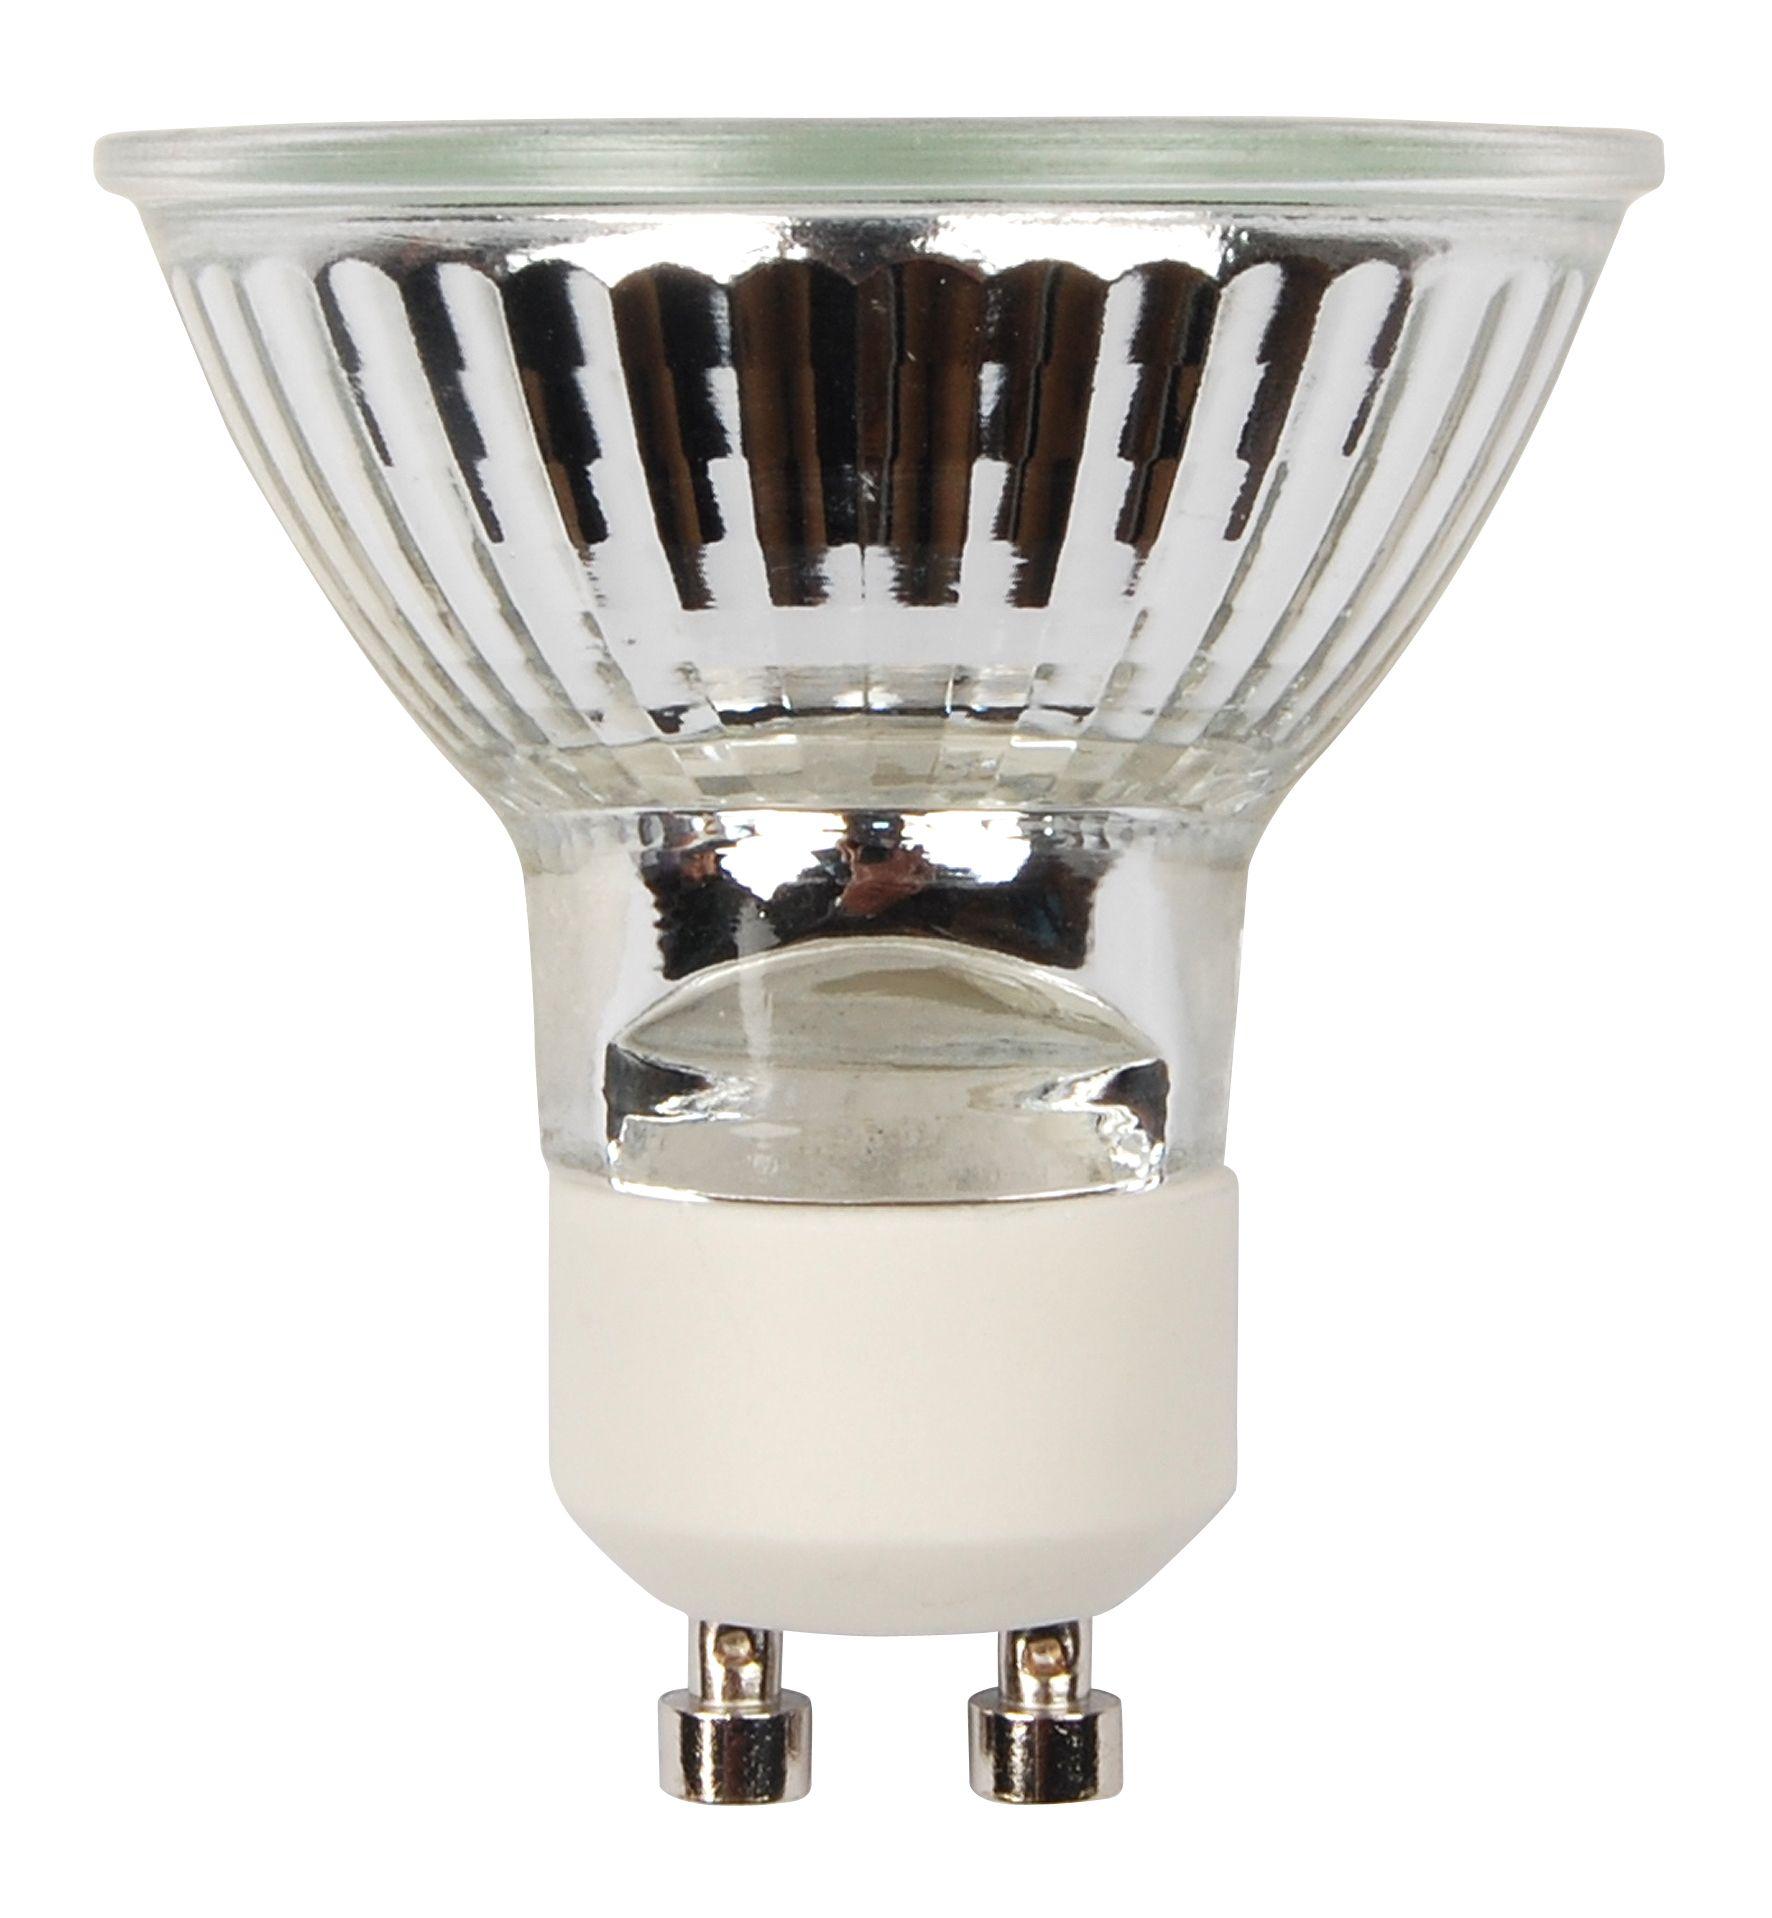 Diall Gu10 40w Halogen Dimmable Reflector Spot Light Bulb, Pack Of 20